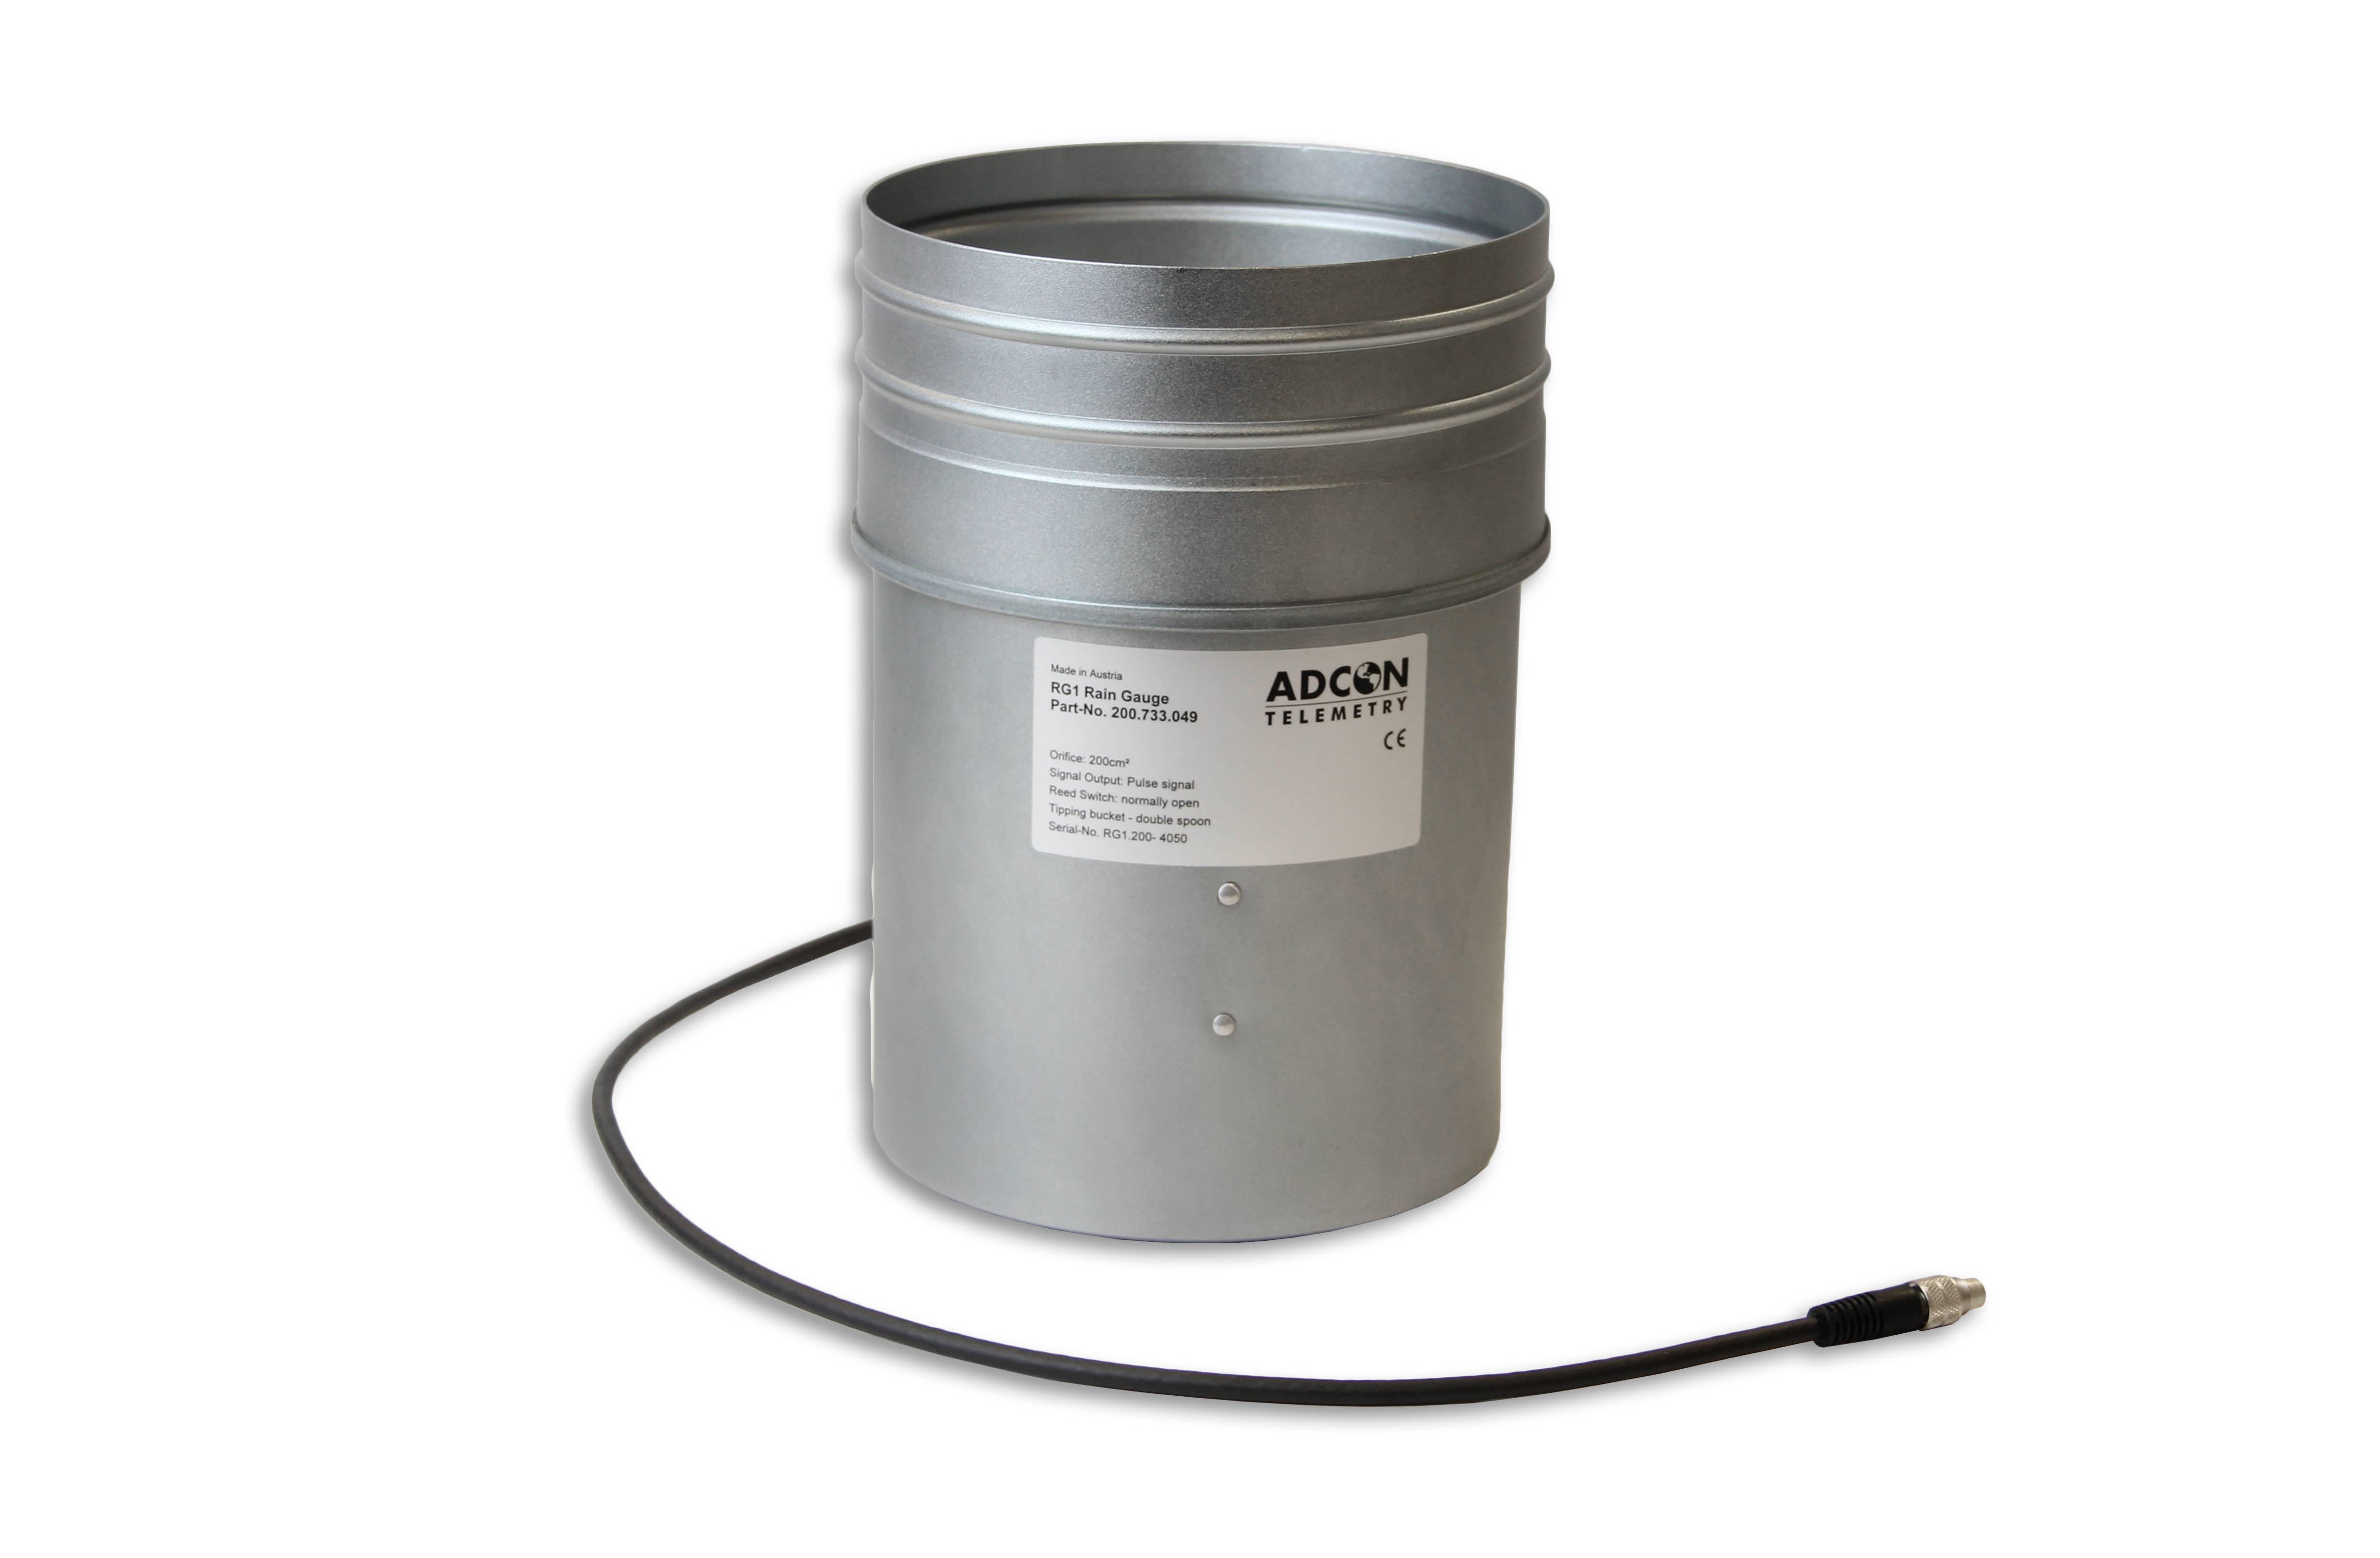 RG1 Tipping Bucket Rain Gauge